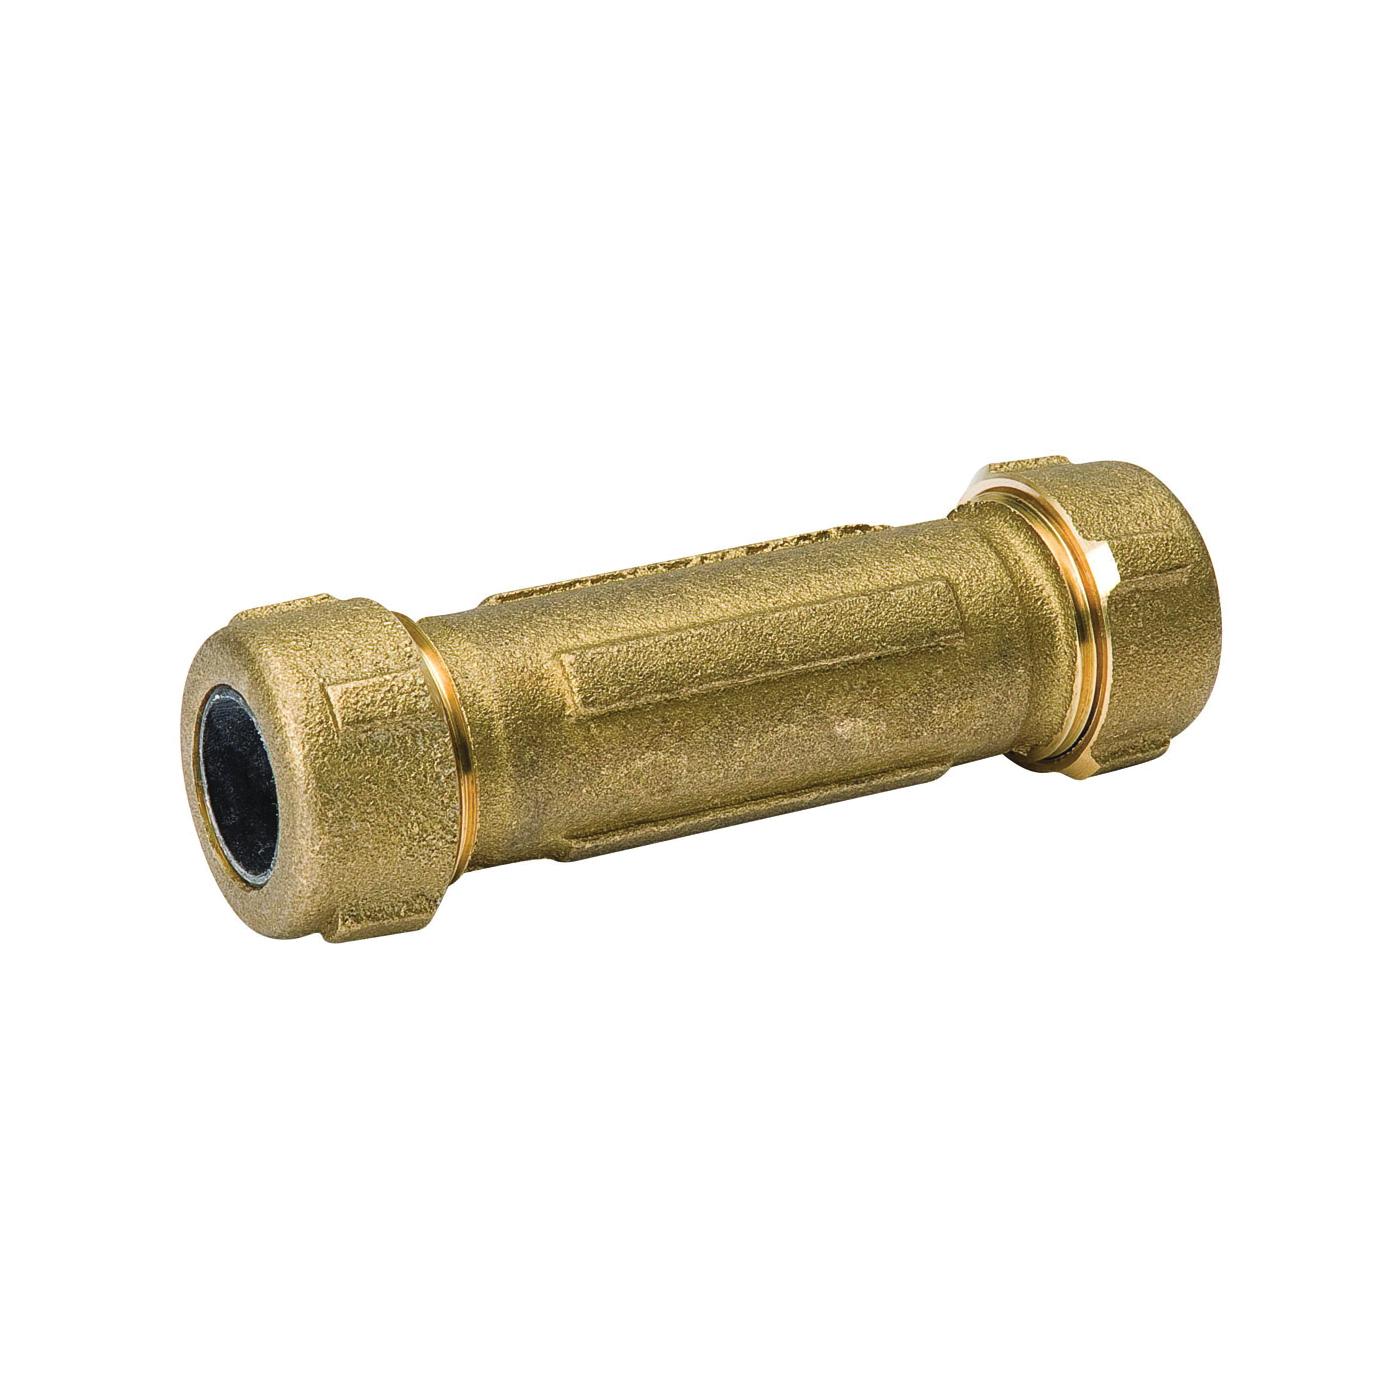 Picture of B & K 160-305NL Compression Coupler, 1 in, Brass, 125 psi Pressure